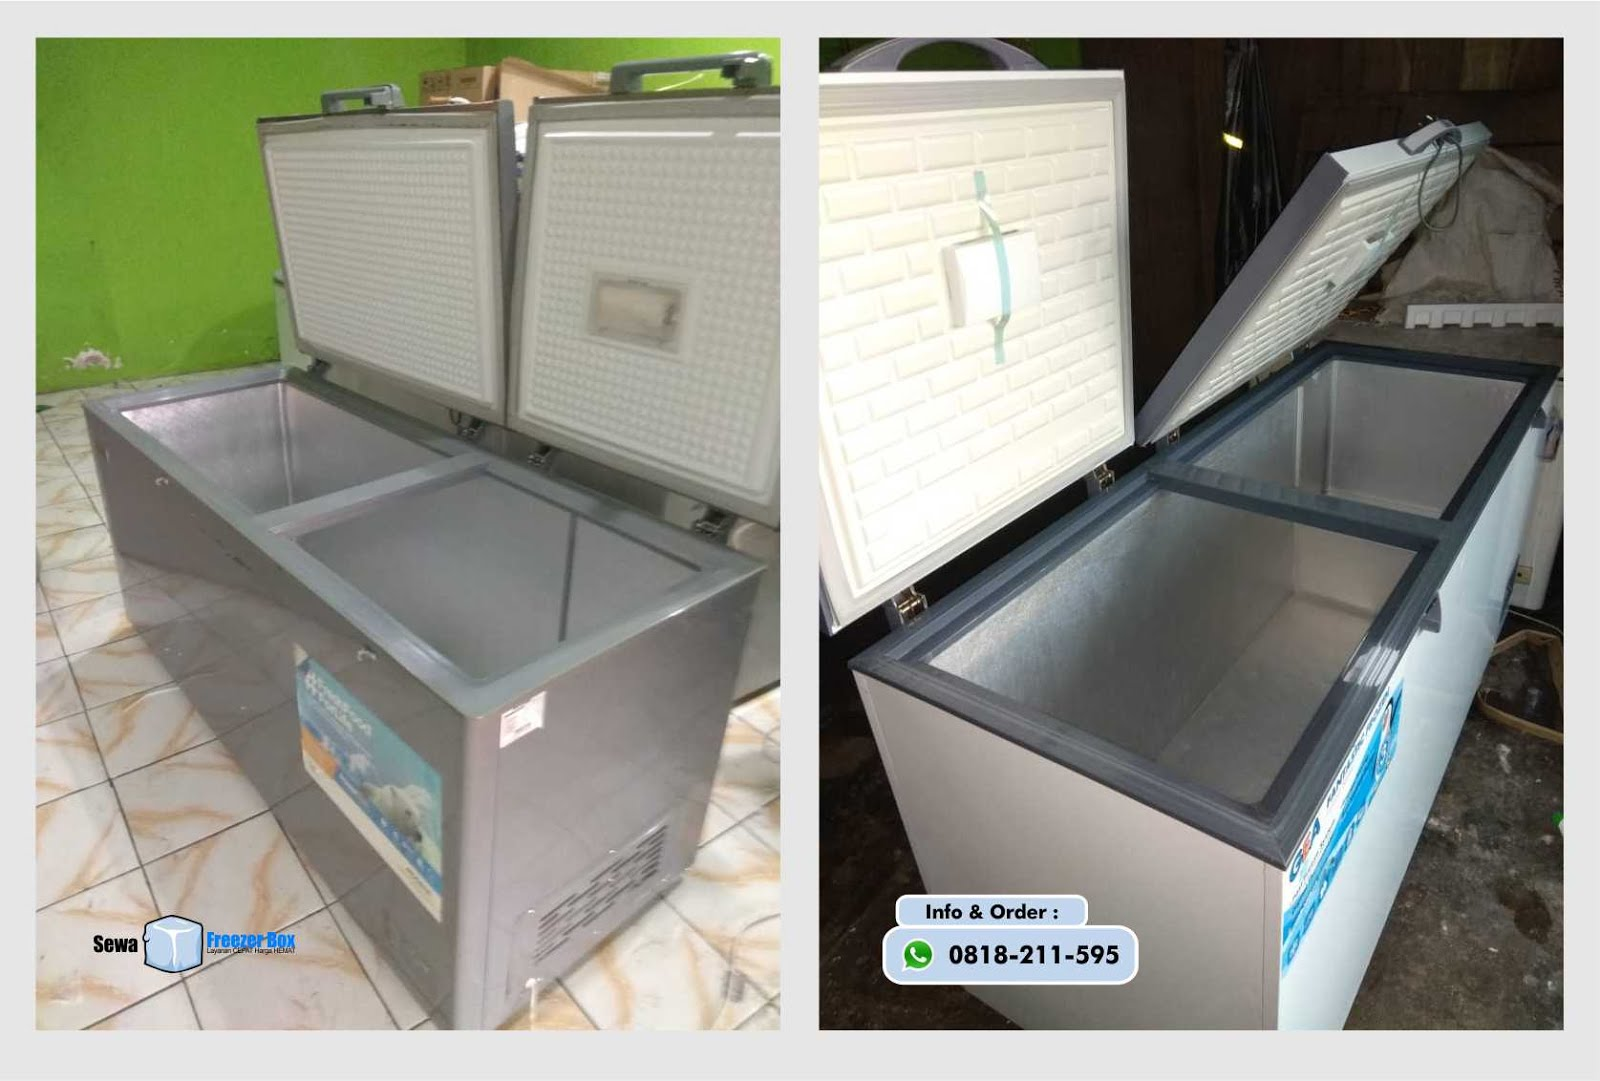 sewa freezer box 600 liter - sewafreezerbox.com